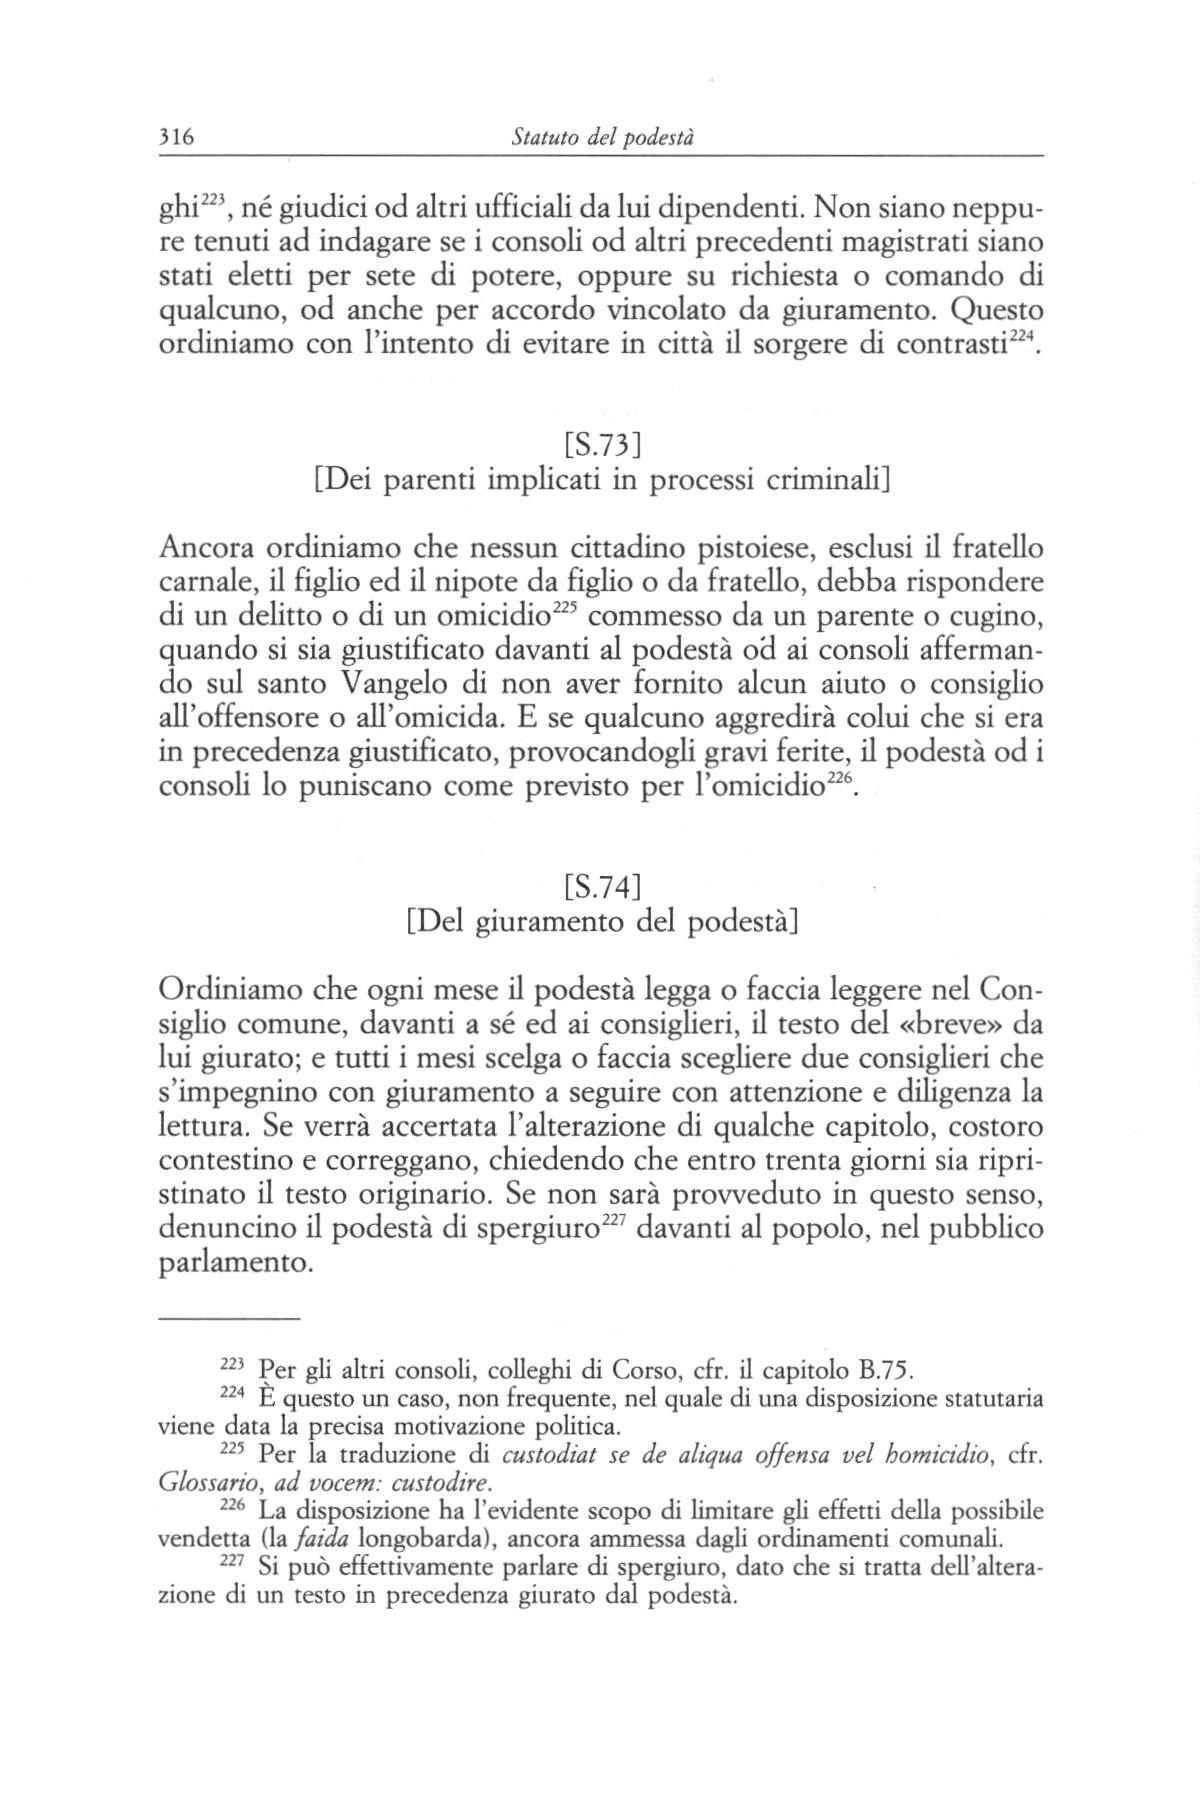 statuti pistoiesi del sec.XII 0316.jpg